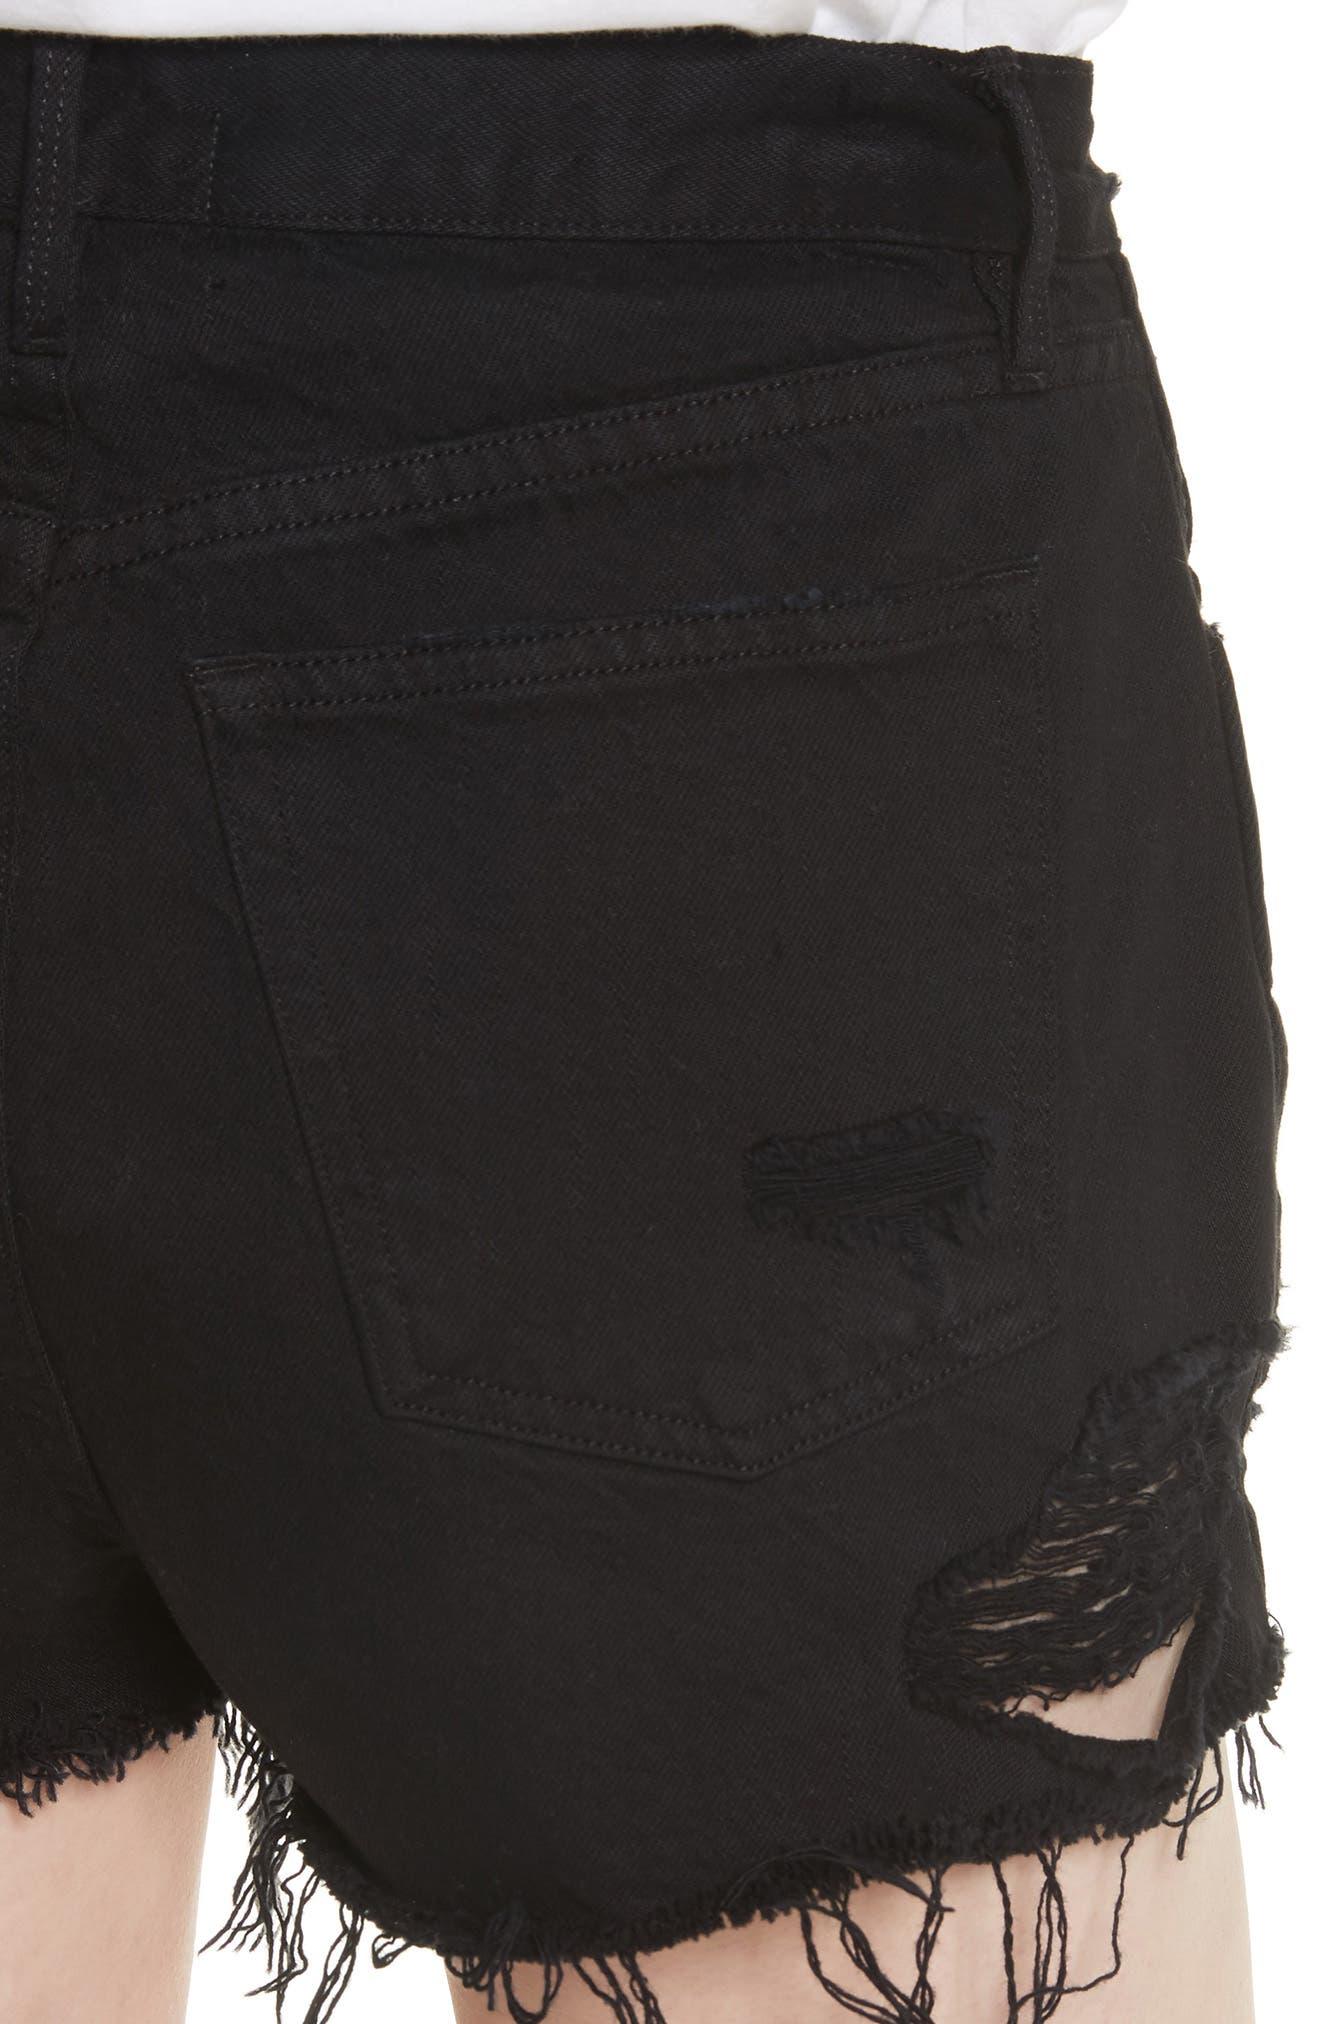 W4 Carter Ripped High Waist Denim Shorts,                             Alternate thumbnail 4, color,                             Carbon